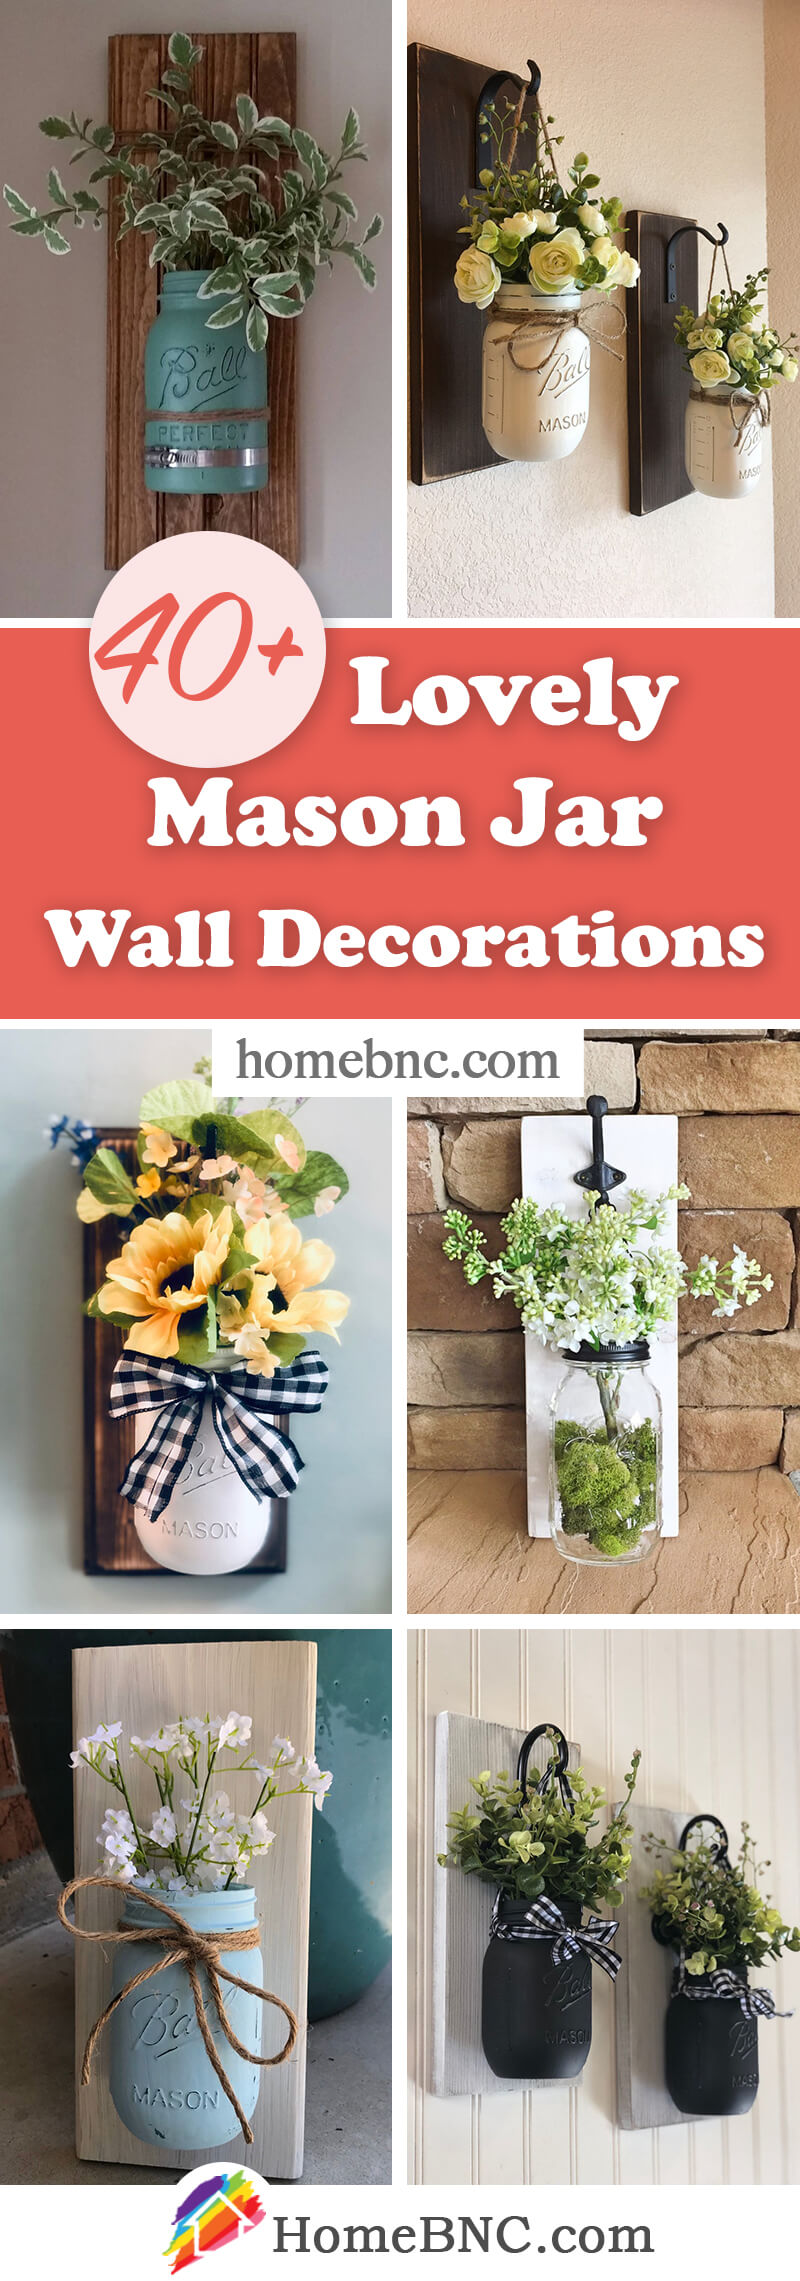 Mason Jar Wall Decor Ideas